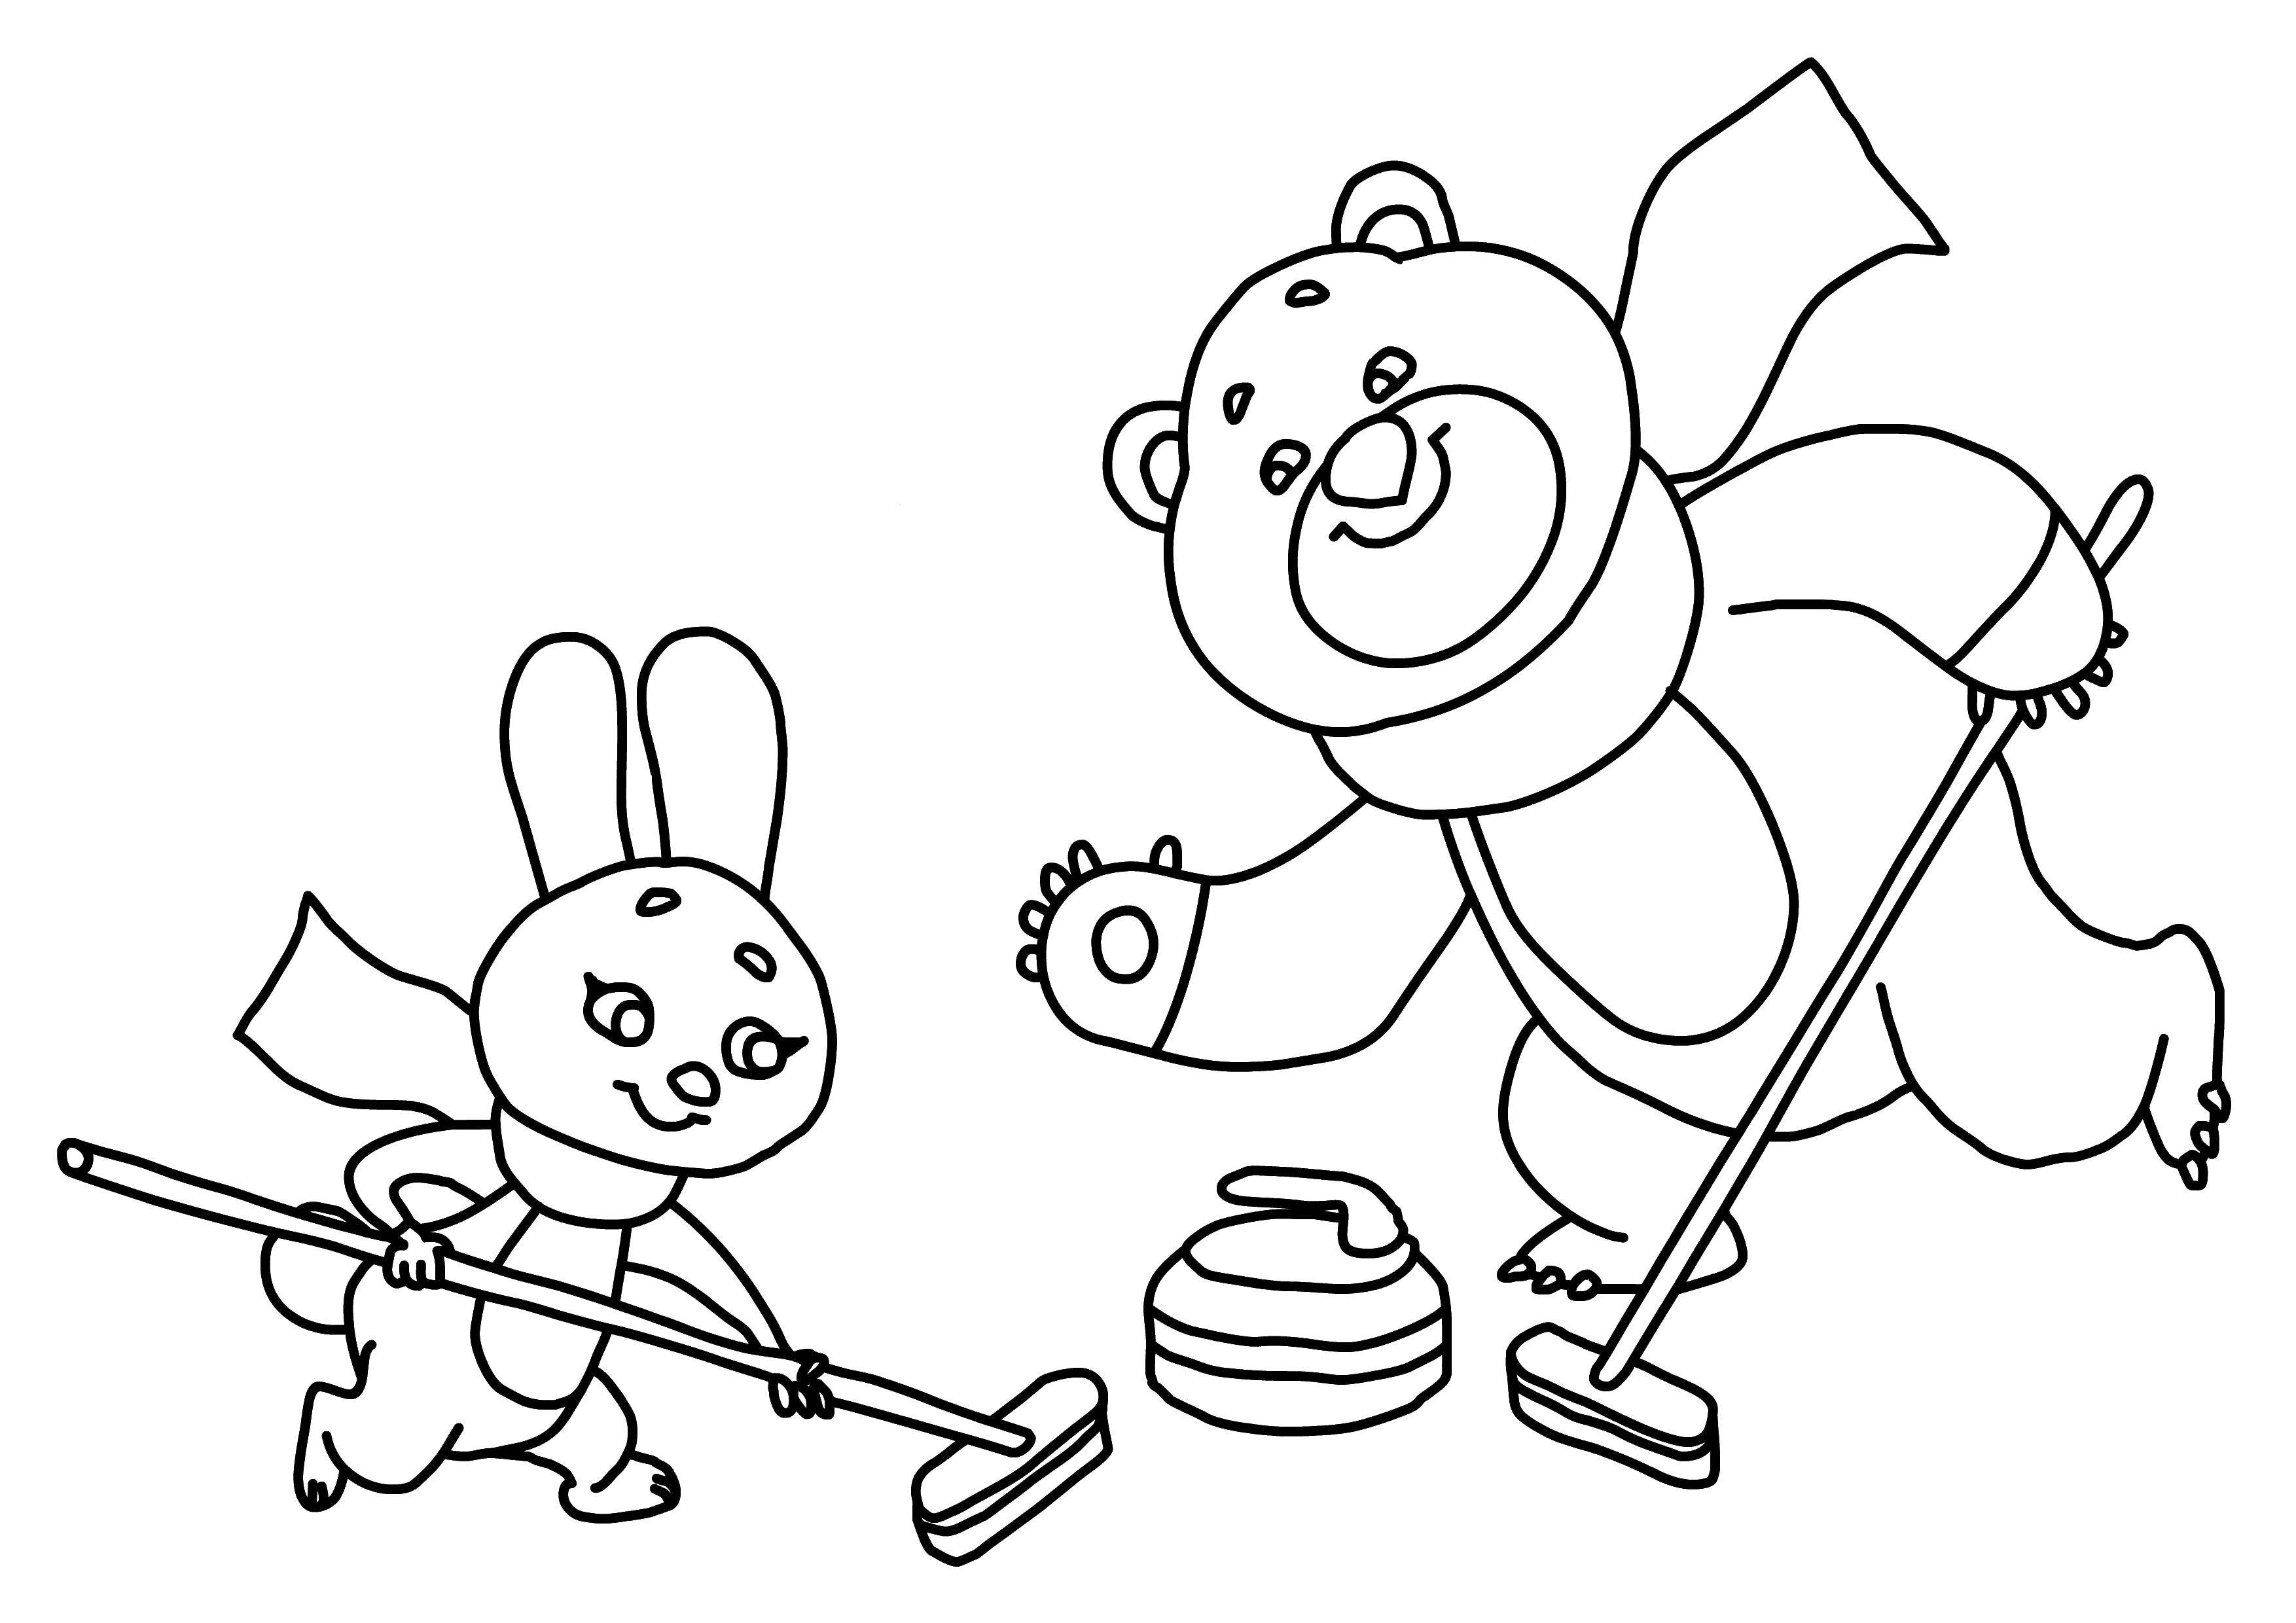 Раскраска Олимпийский мишка и заяц играют в керлинг Скачать мишка, заяц, керлинг.  Распечатать ,олимпийские игры,